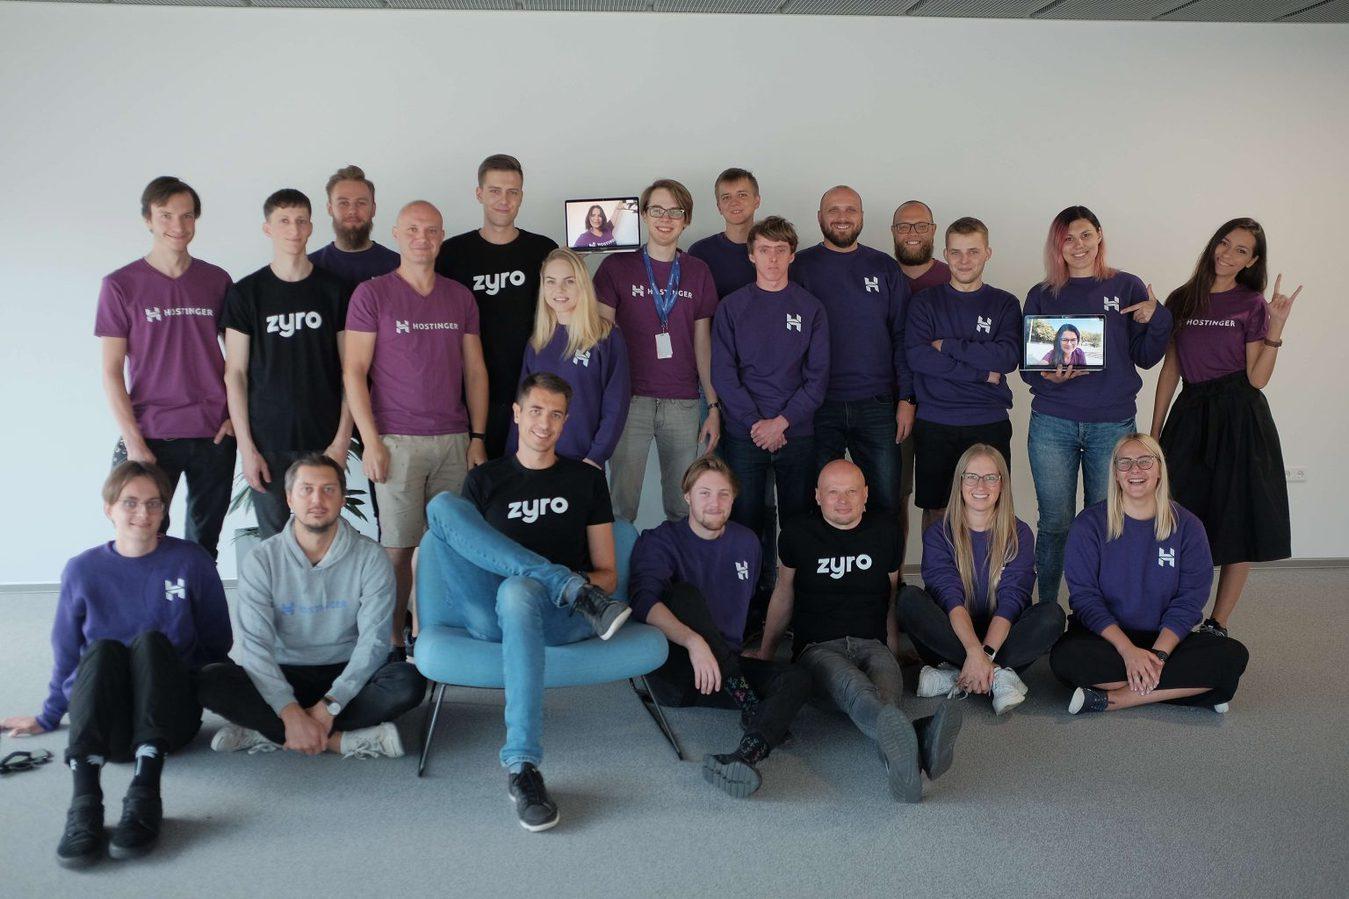 Zyro Team